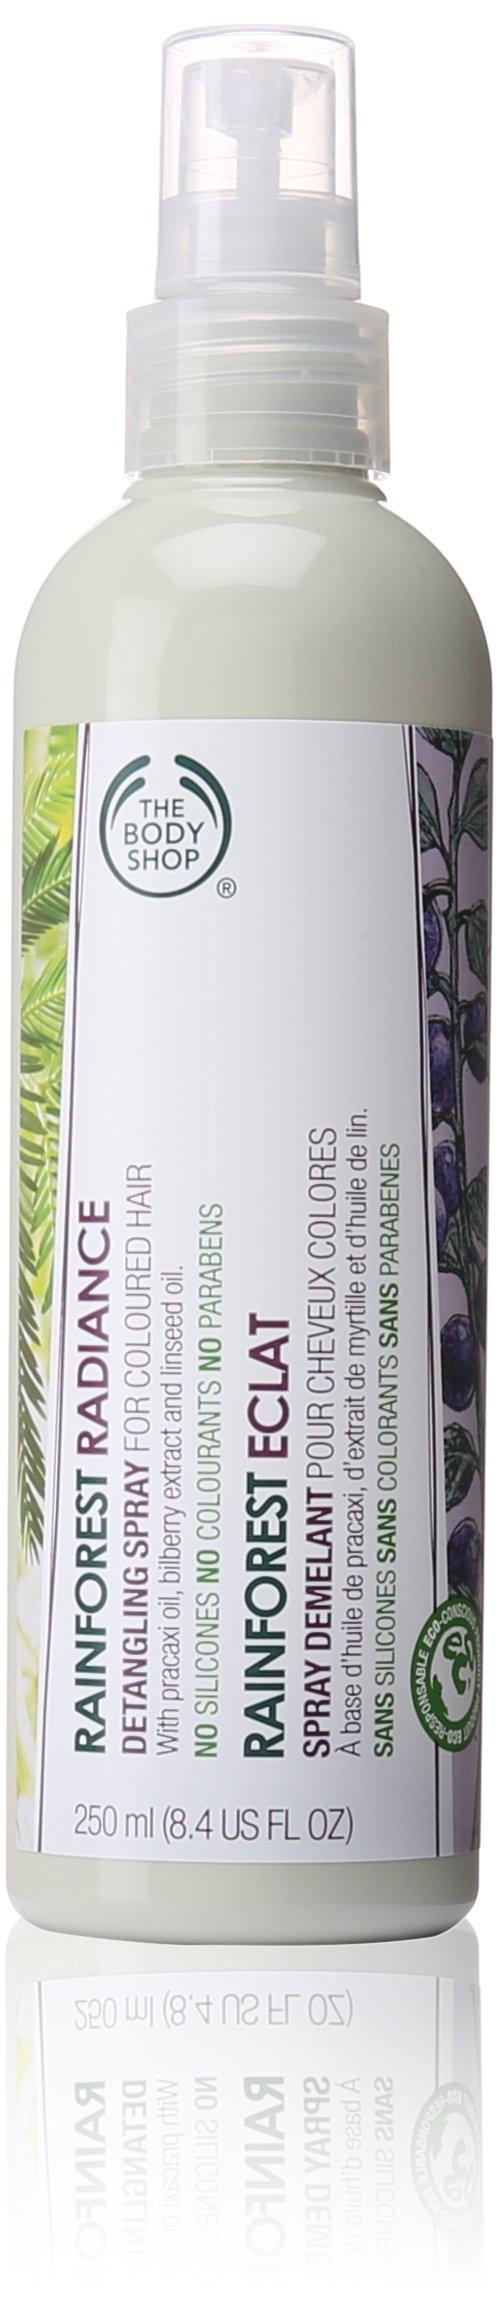 The Body Shop Rainforest Radiance Detangling Spray, 8.4 Fl Oz by The Body Shop